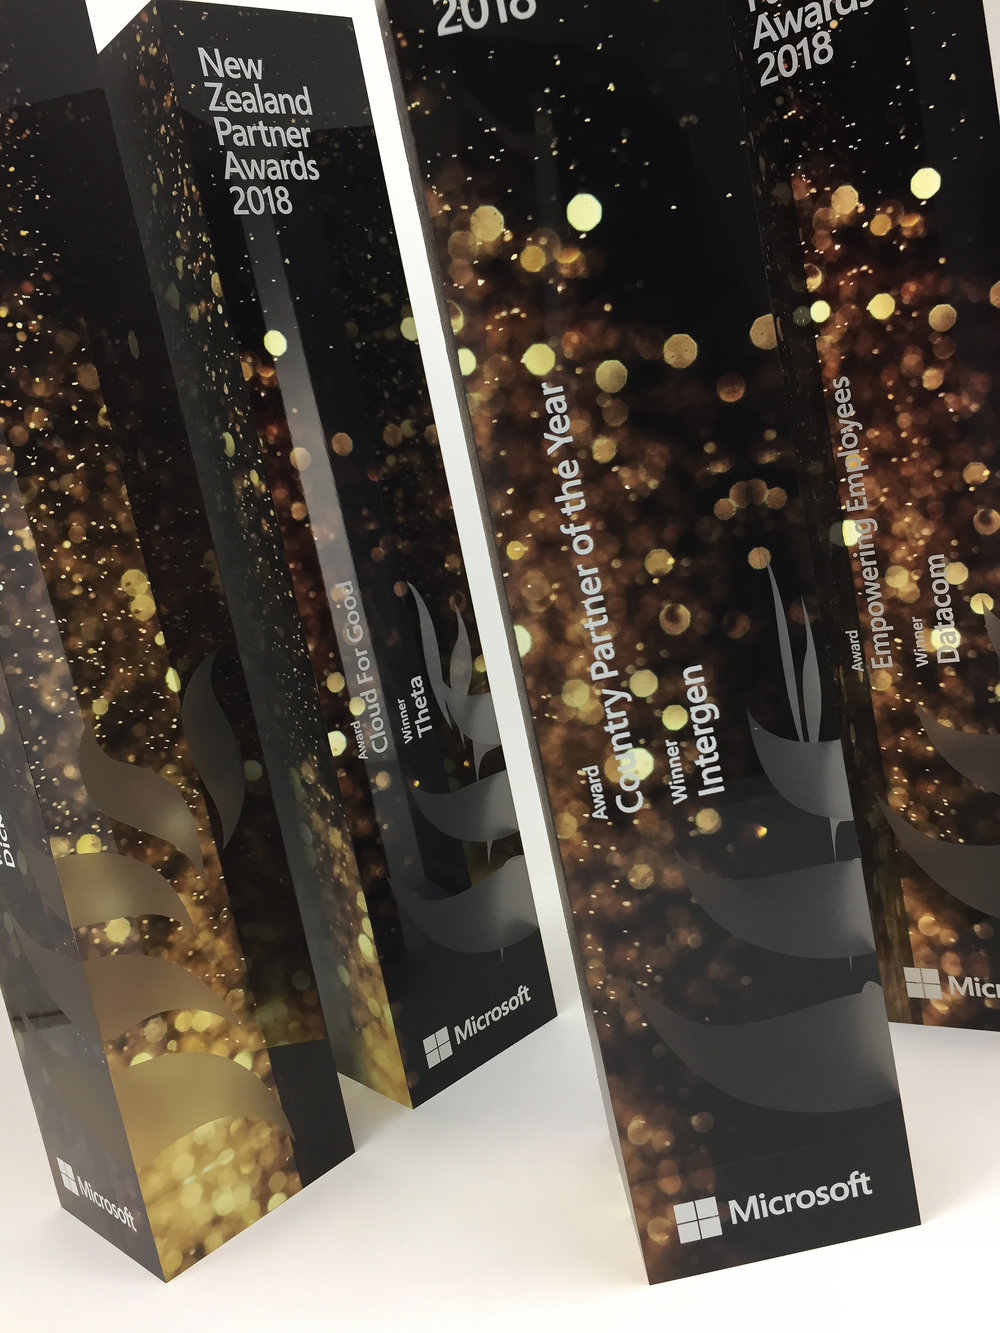 microsoft-newzealand-partner-awards-acrylic-2018-02.jpg